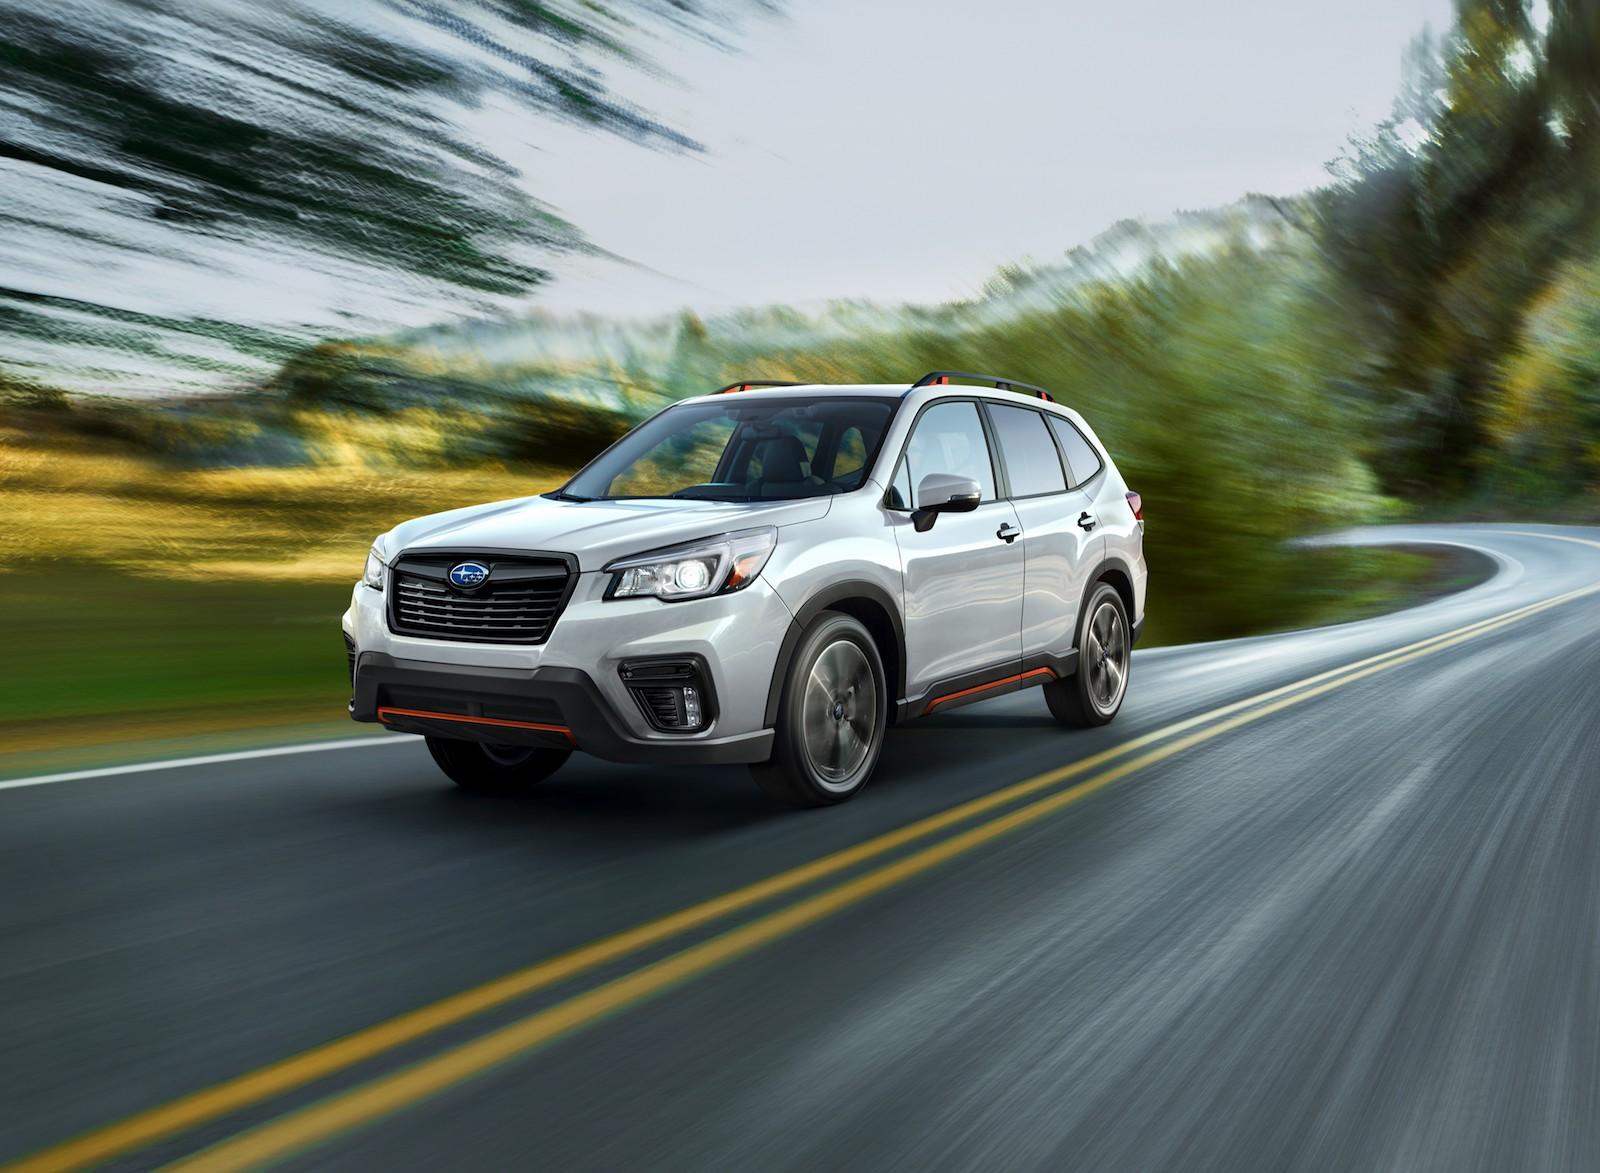 2019 Subaru Forester Revealed At New York International Auto Show